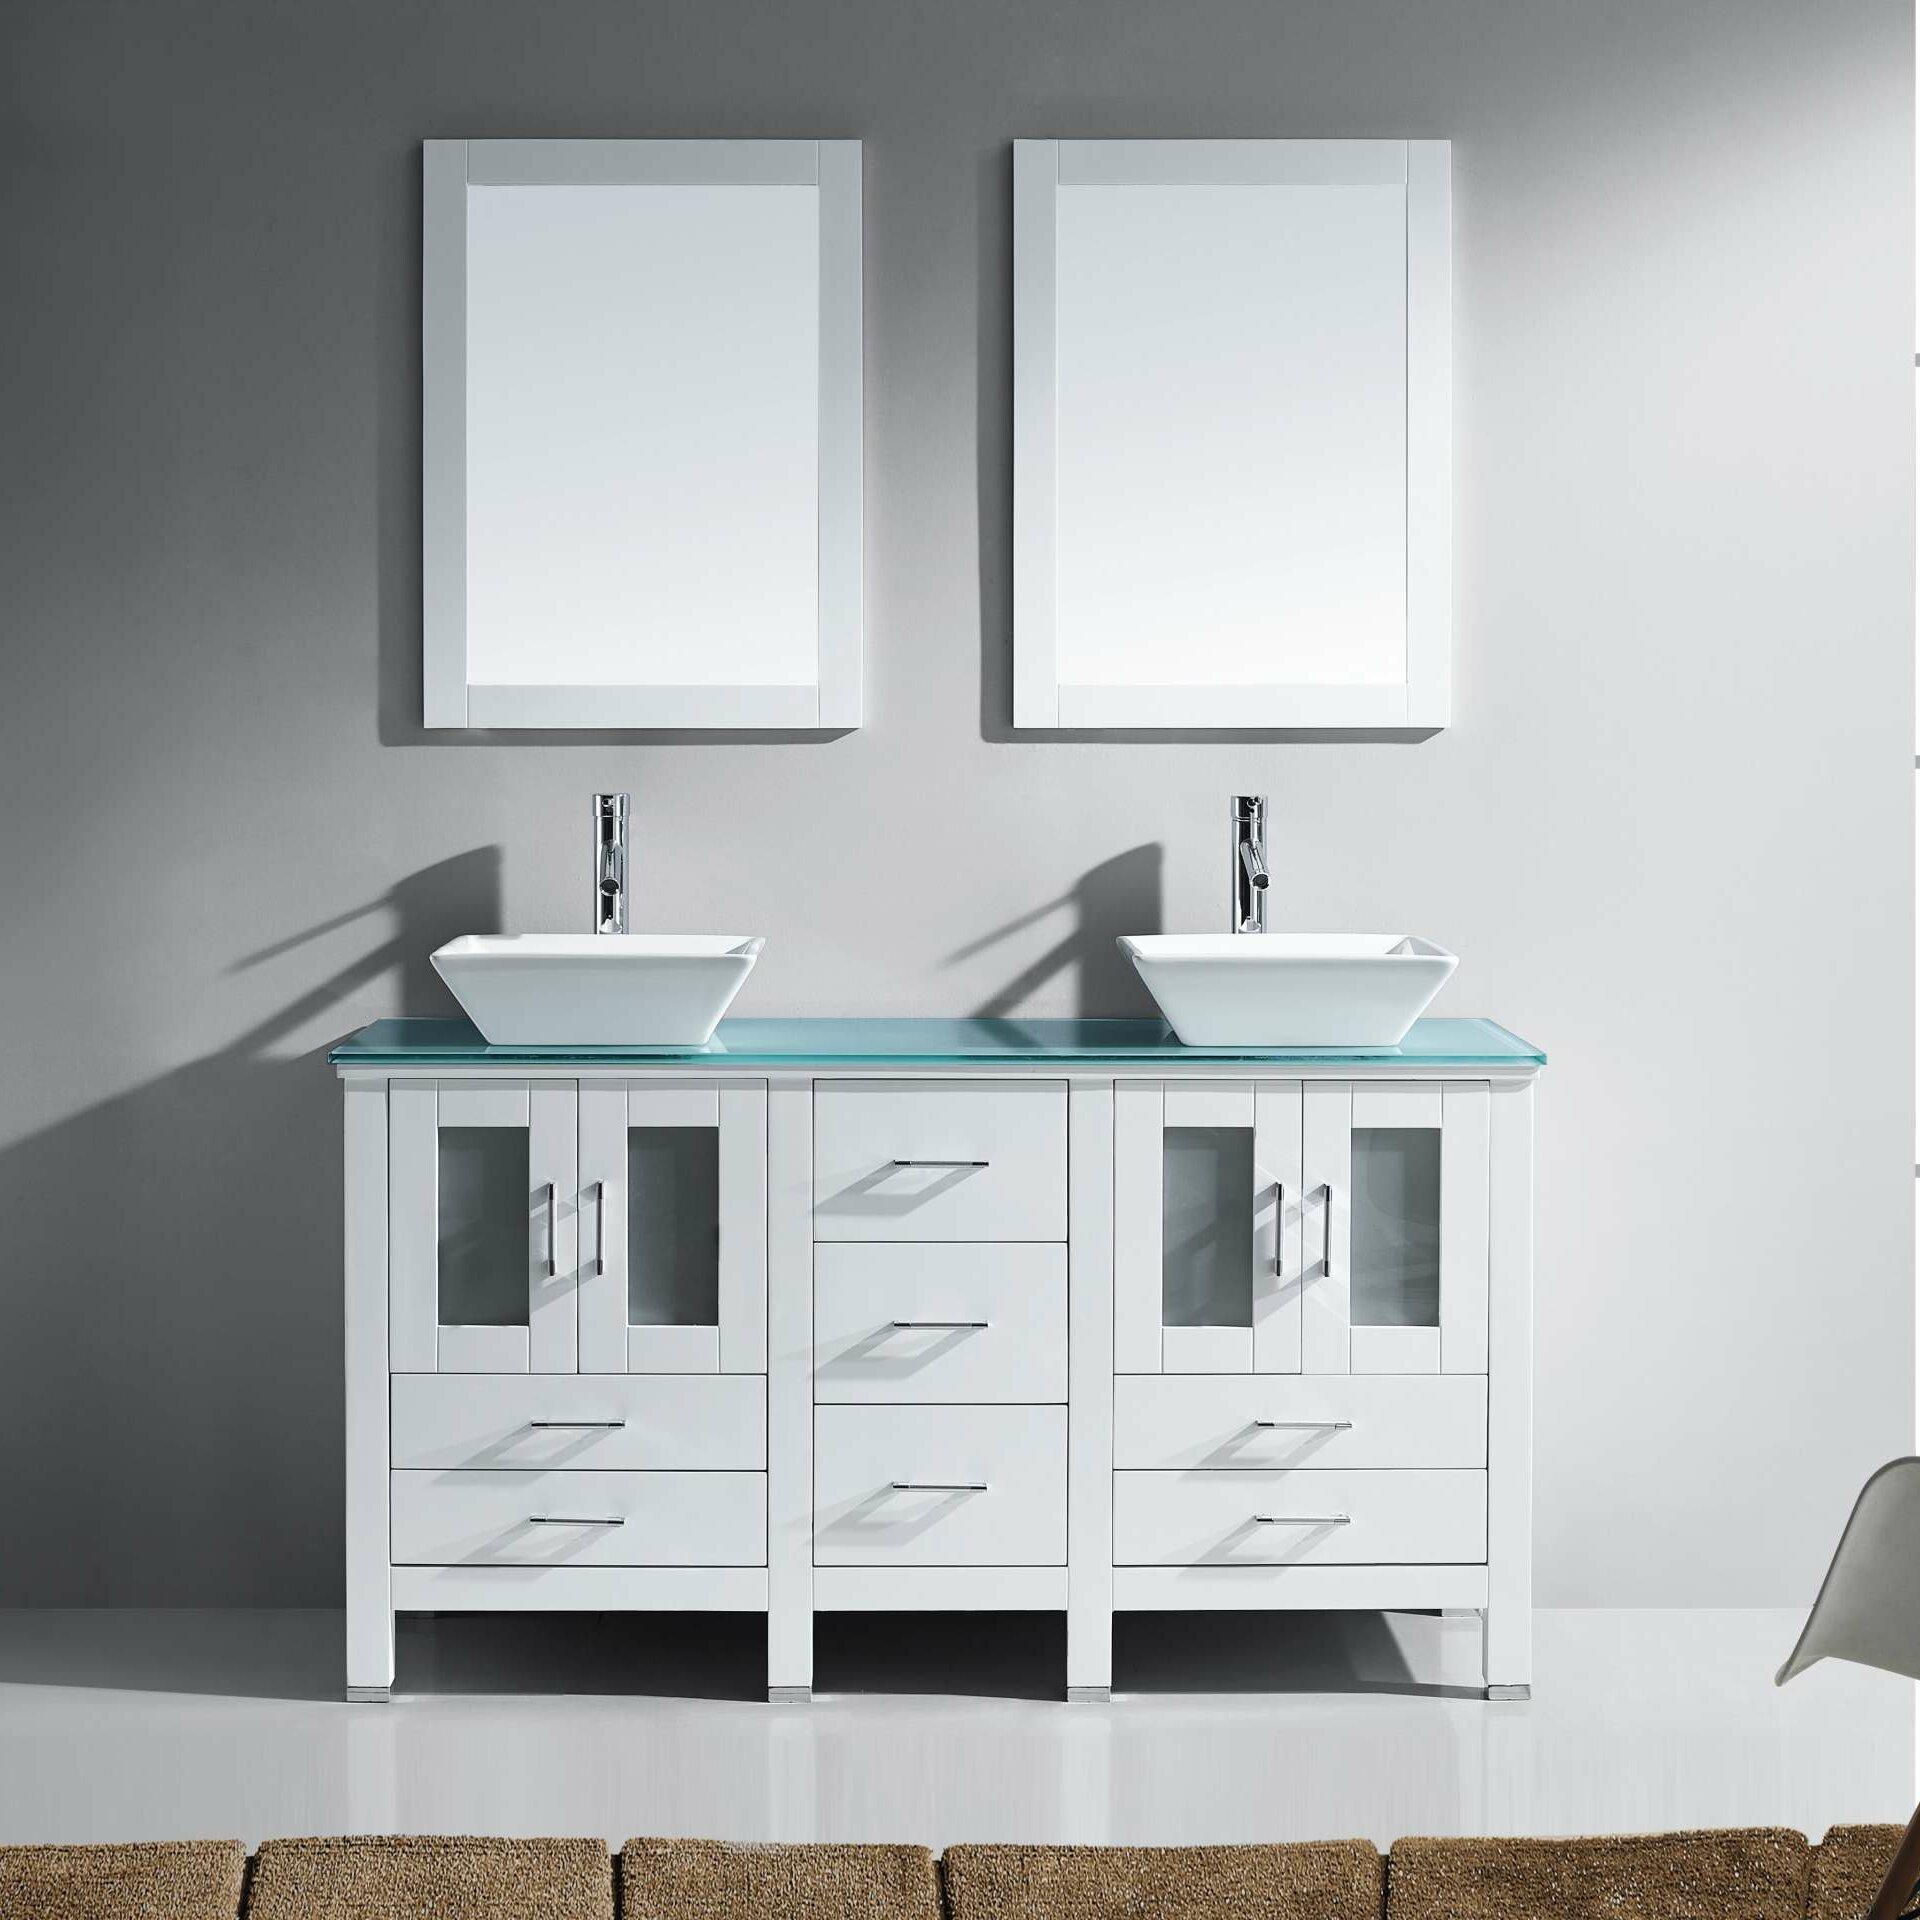 Virtu bathroom accessories - Brentford Series 60 Double Bathroom Vanity Set With Tempered Glass Top And Mirror